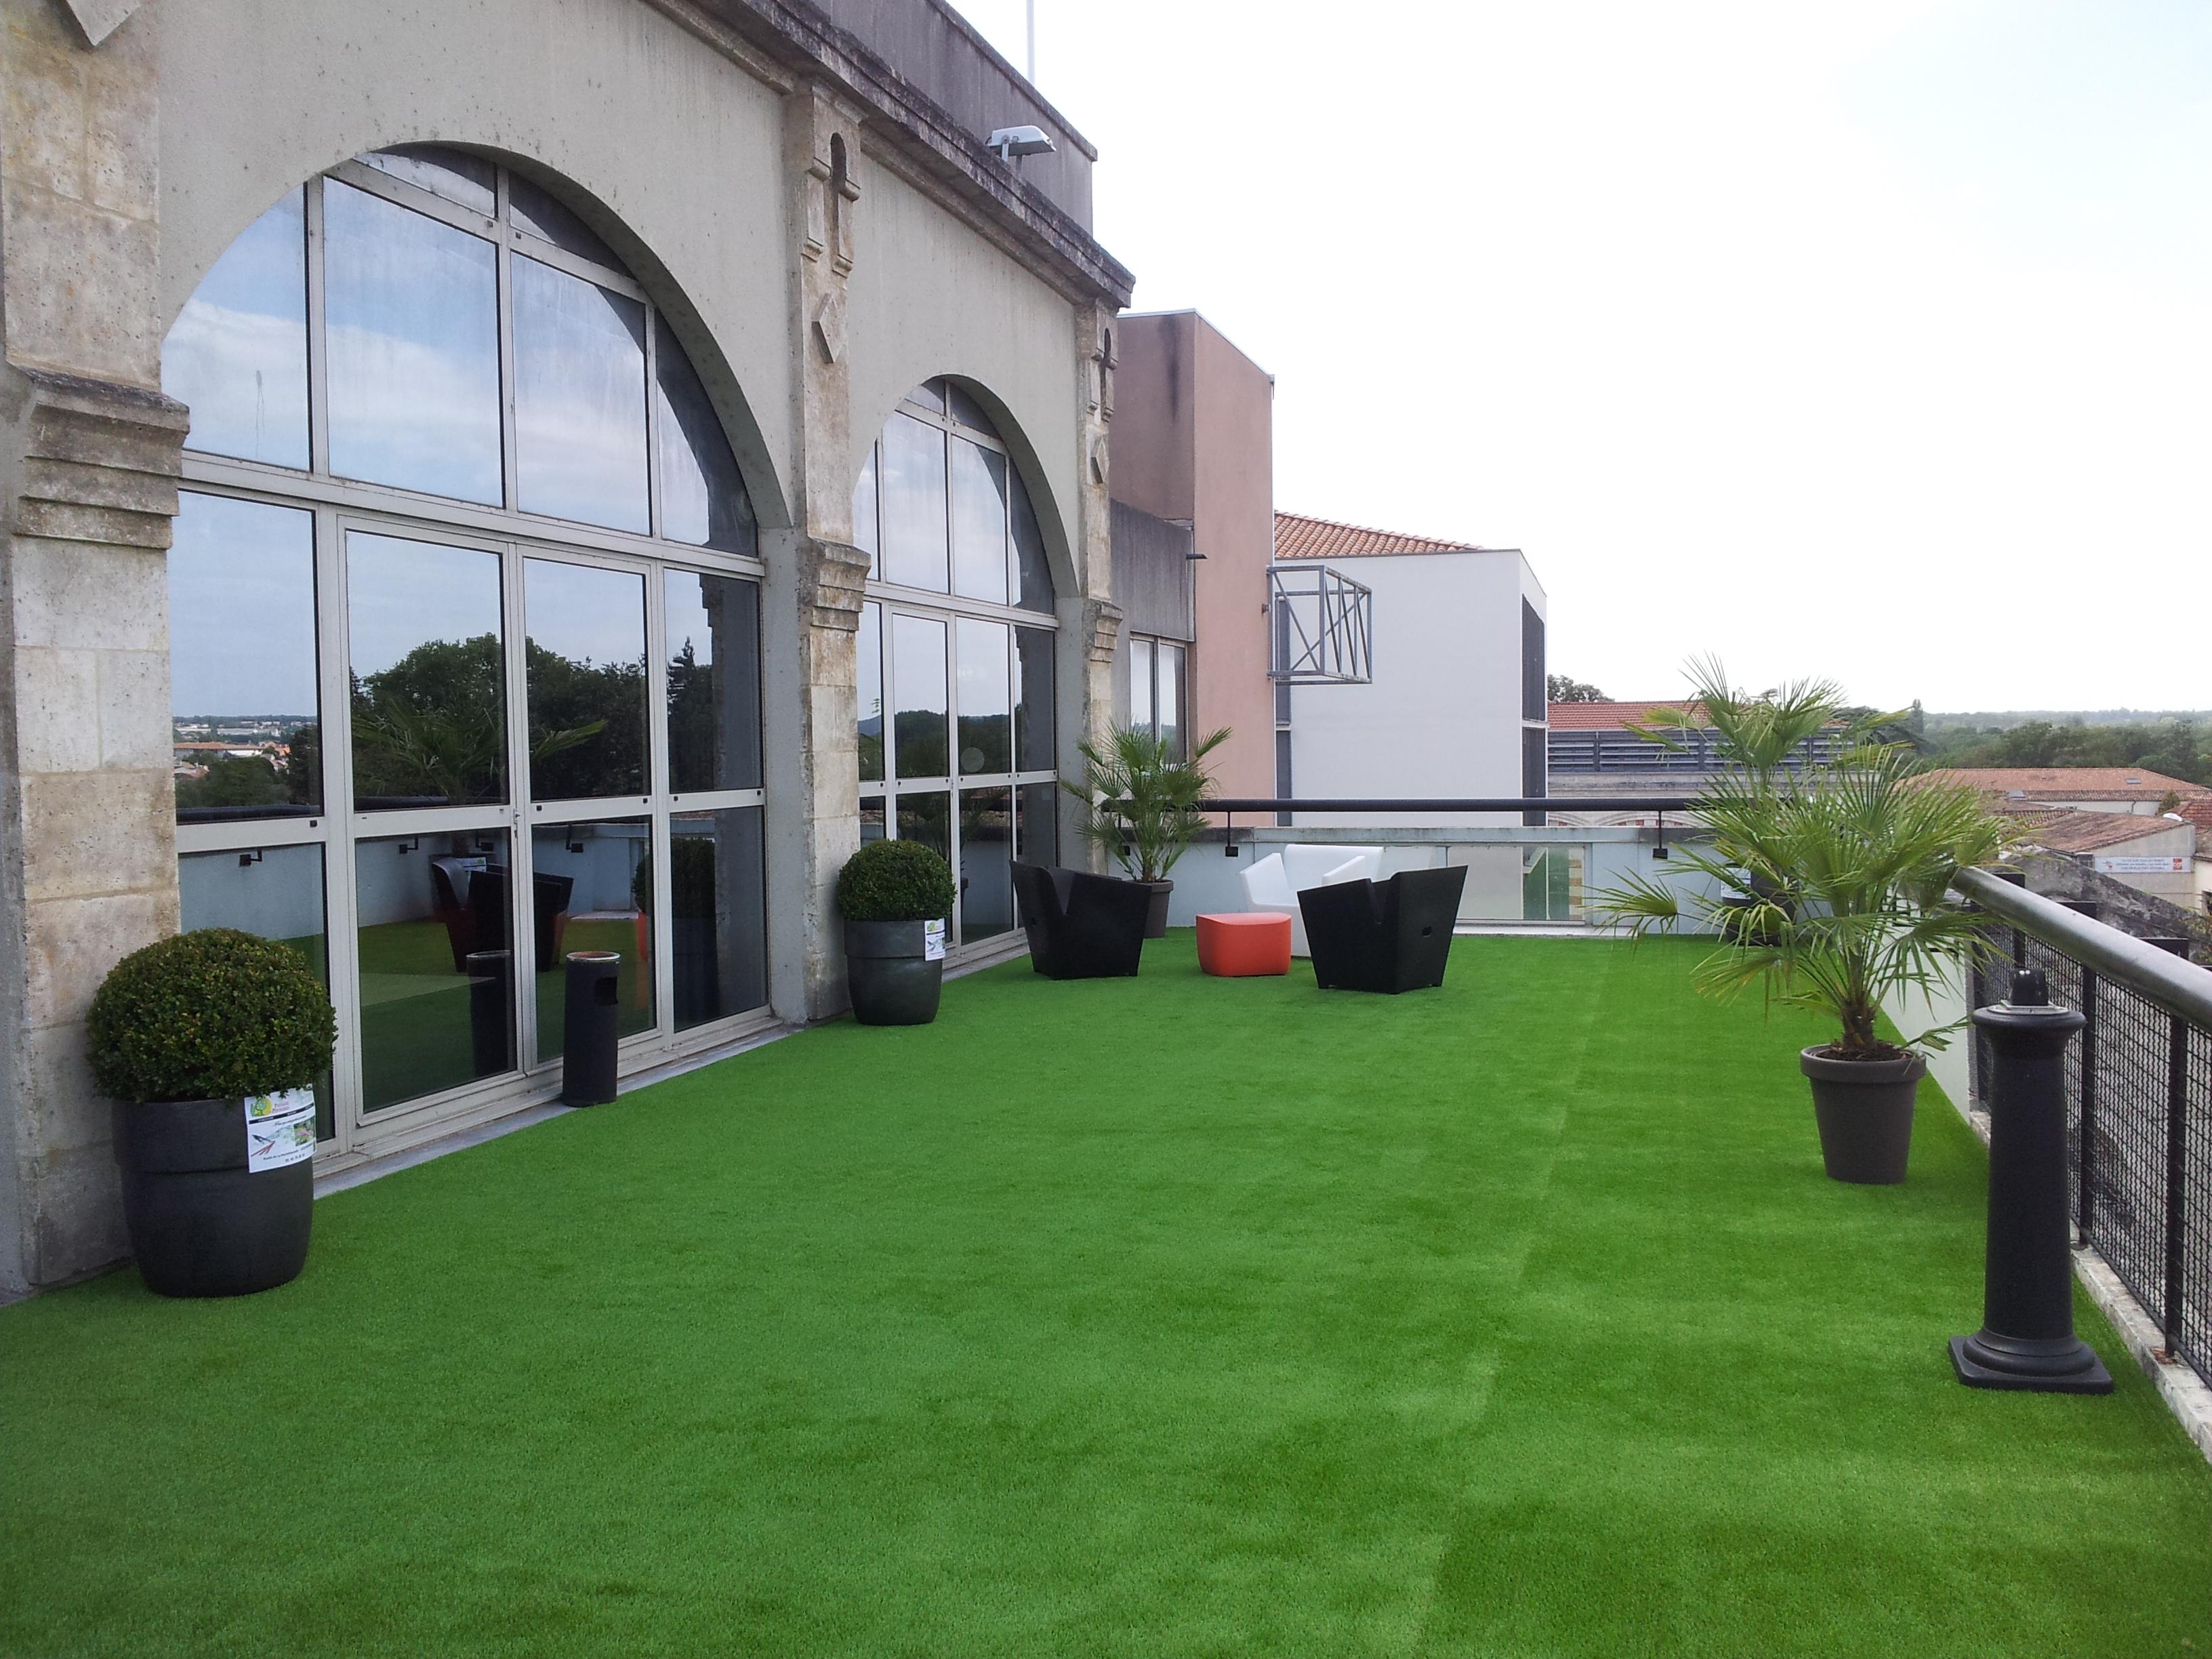 Paysagiste cloture angouleme montbron charente terrasse for Entretien jardin charente